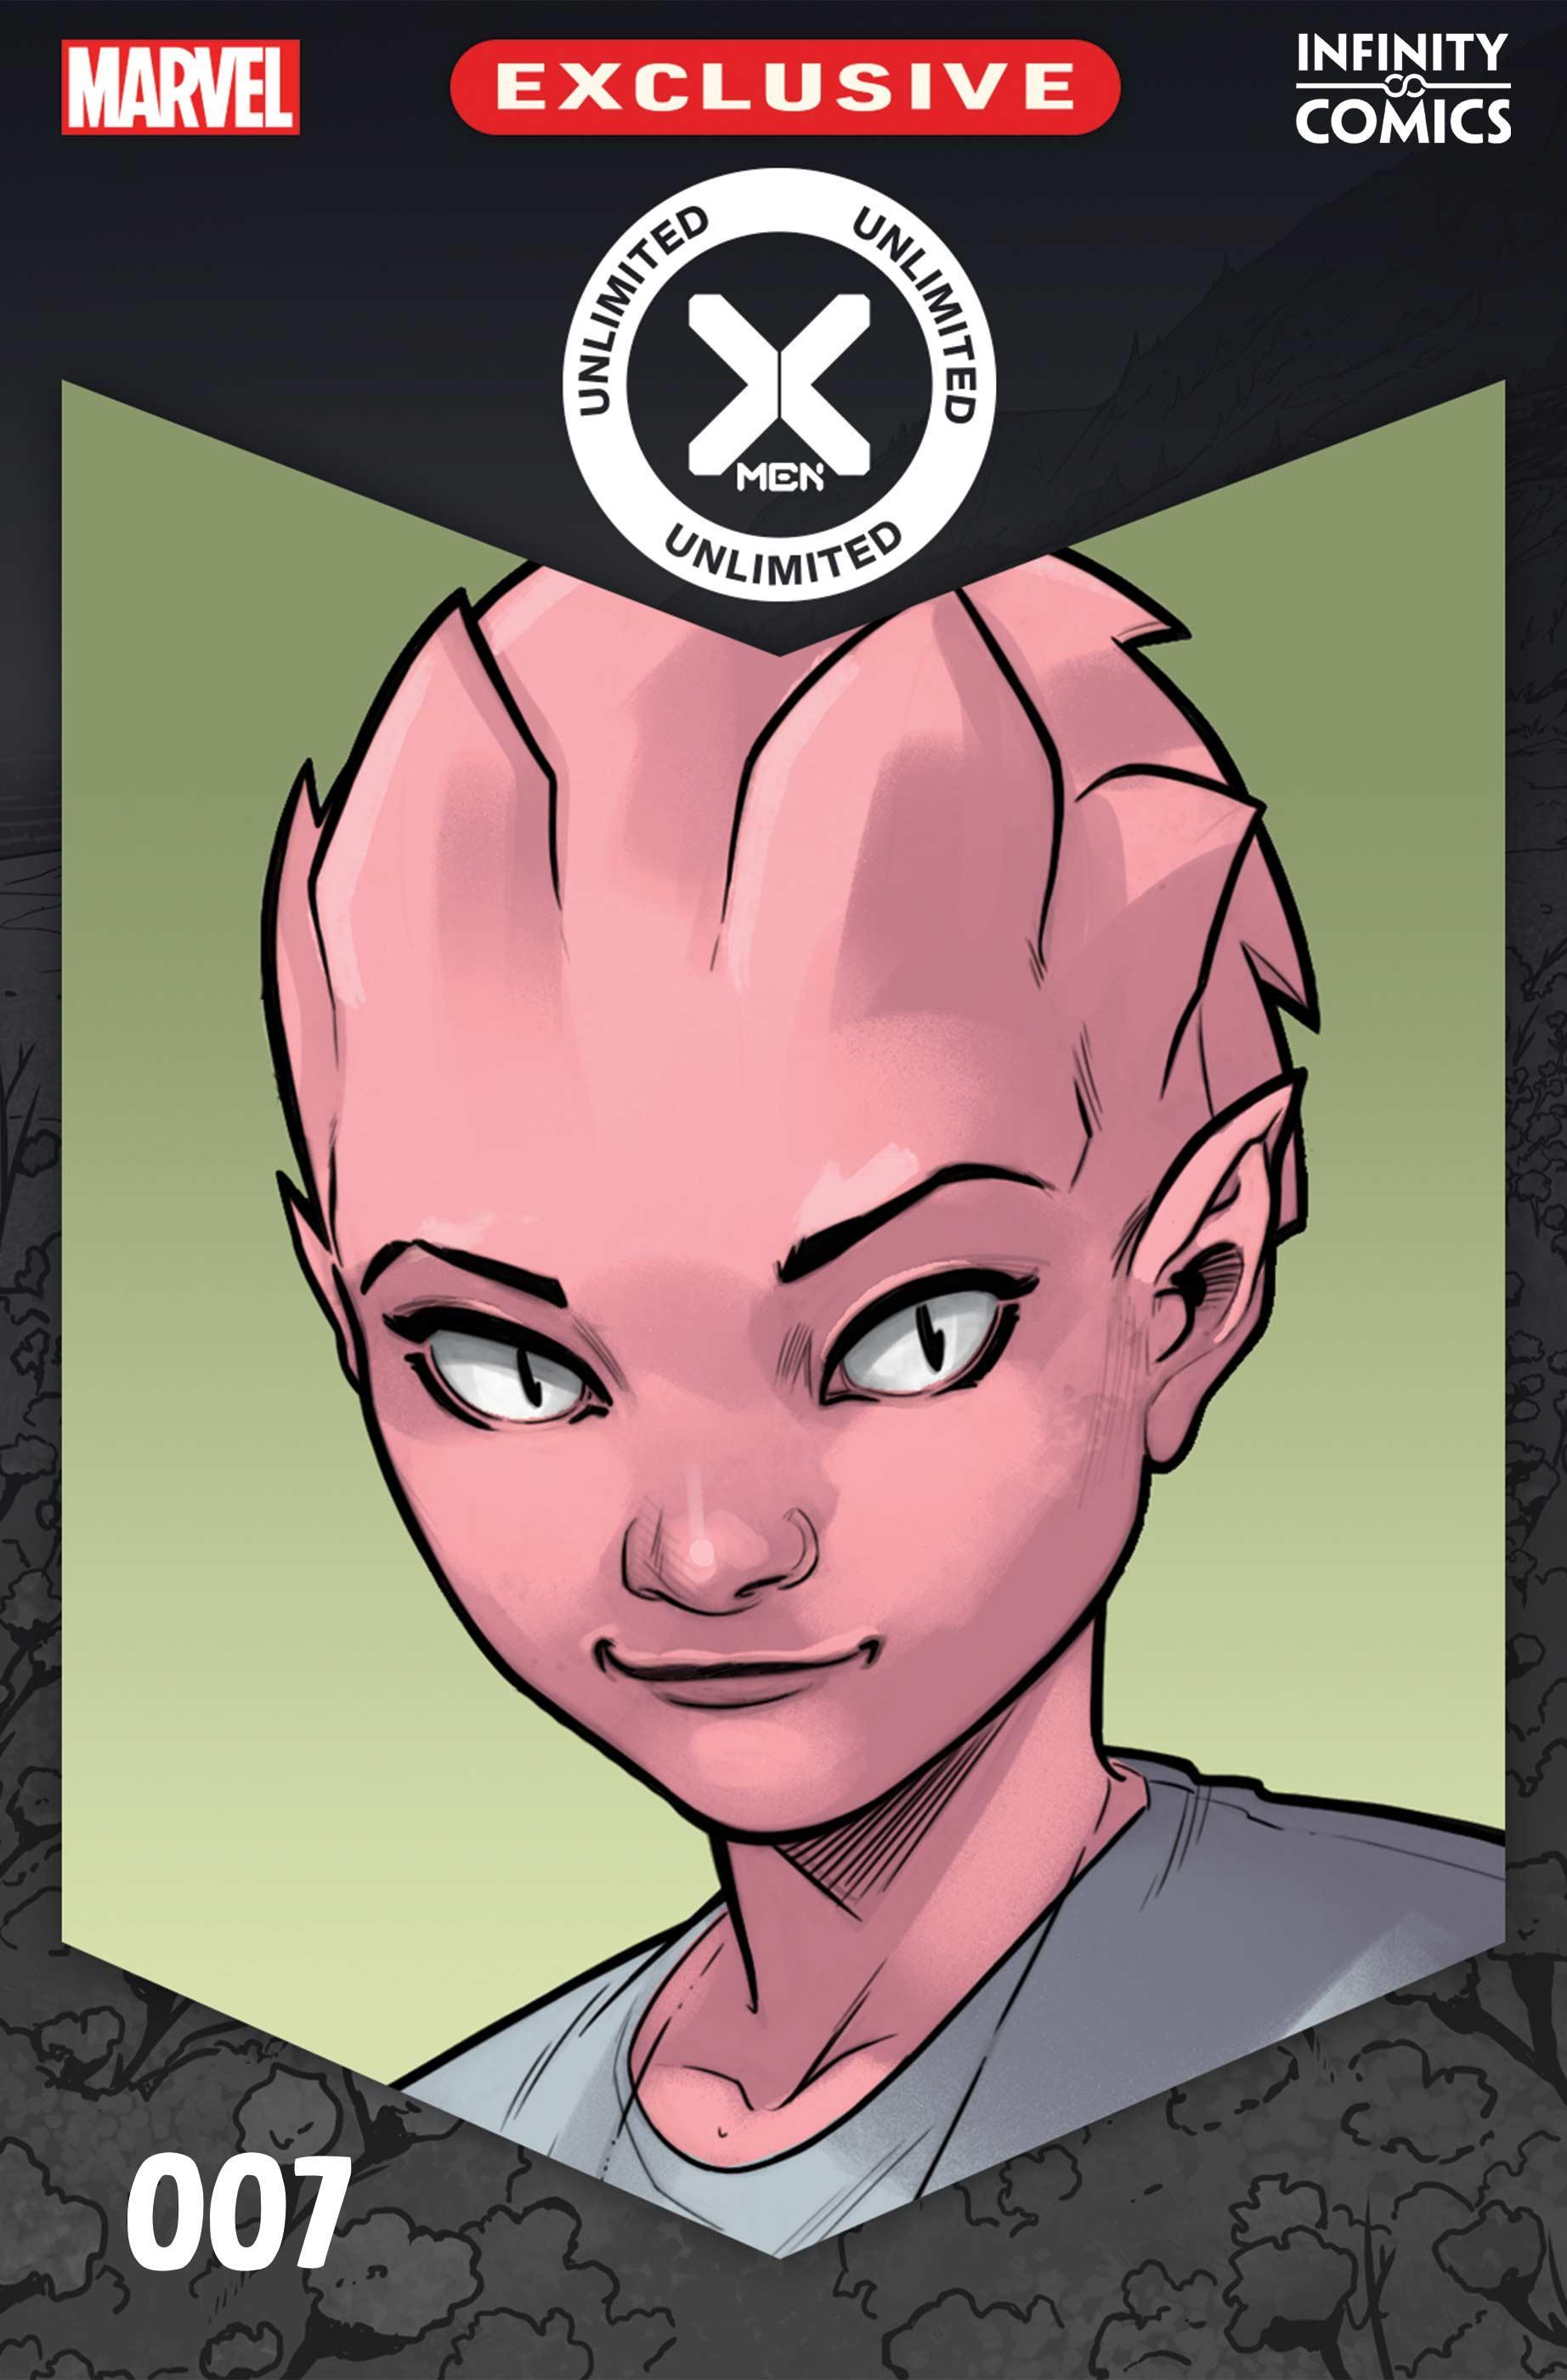 X Men Unlimited Infinity Comic 007 (2021) (Digital Mobile) (Infinity Empire